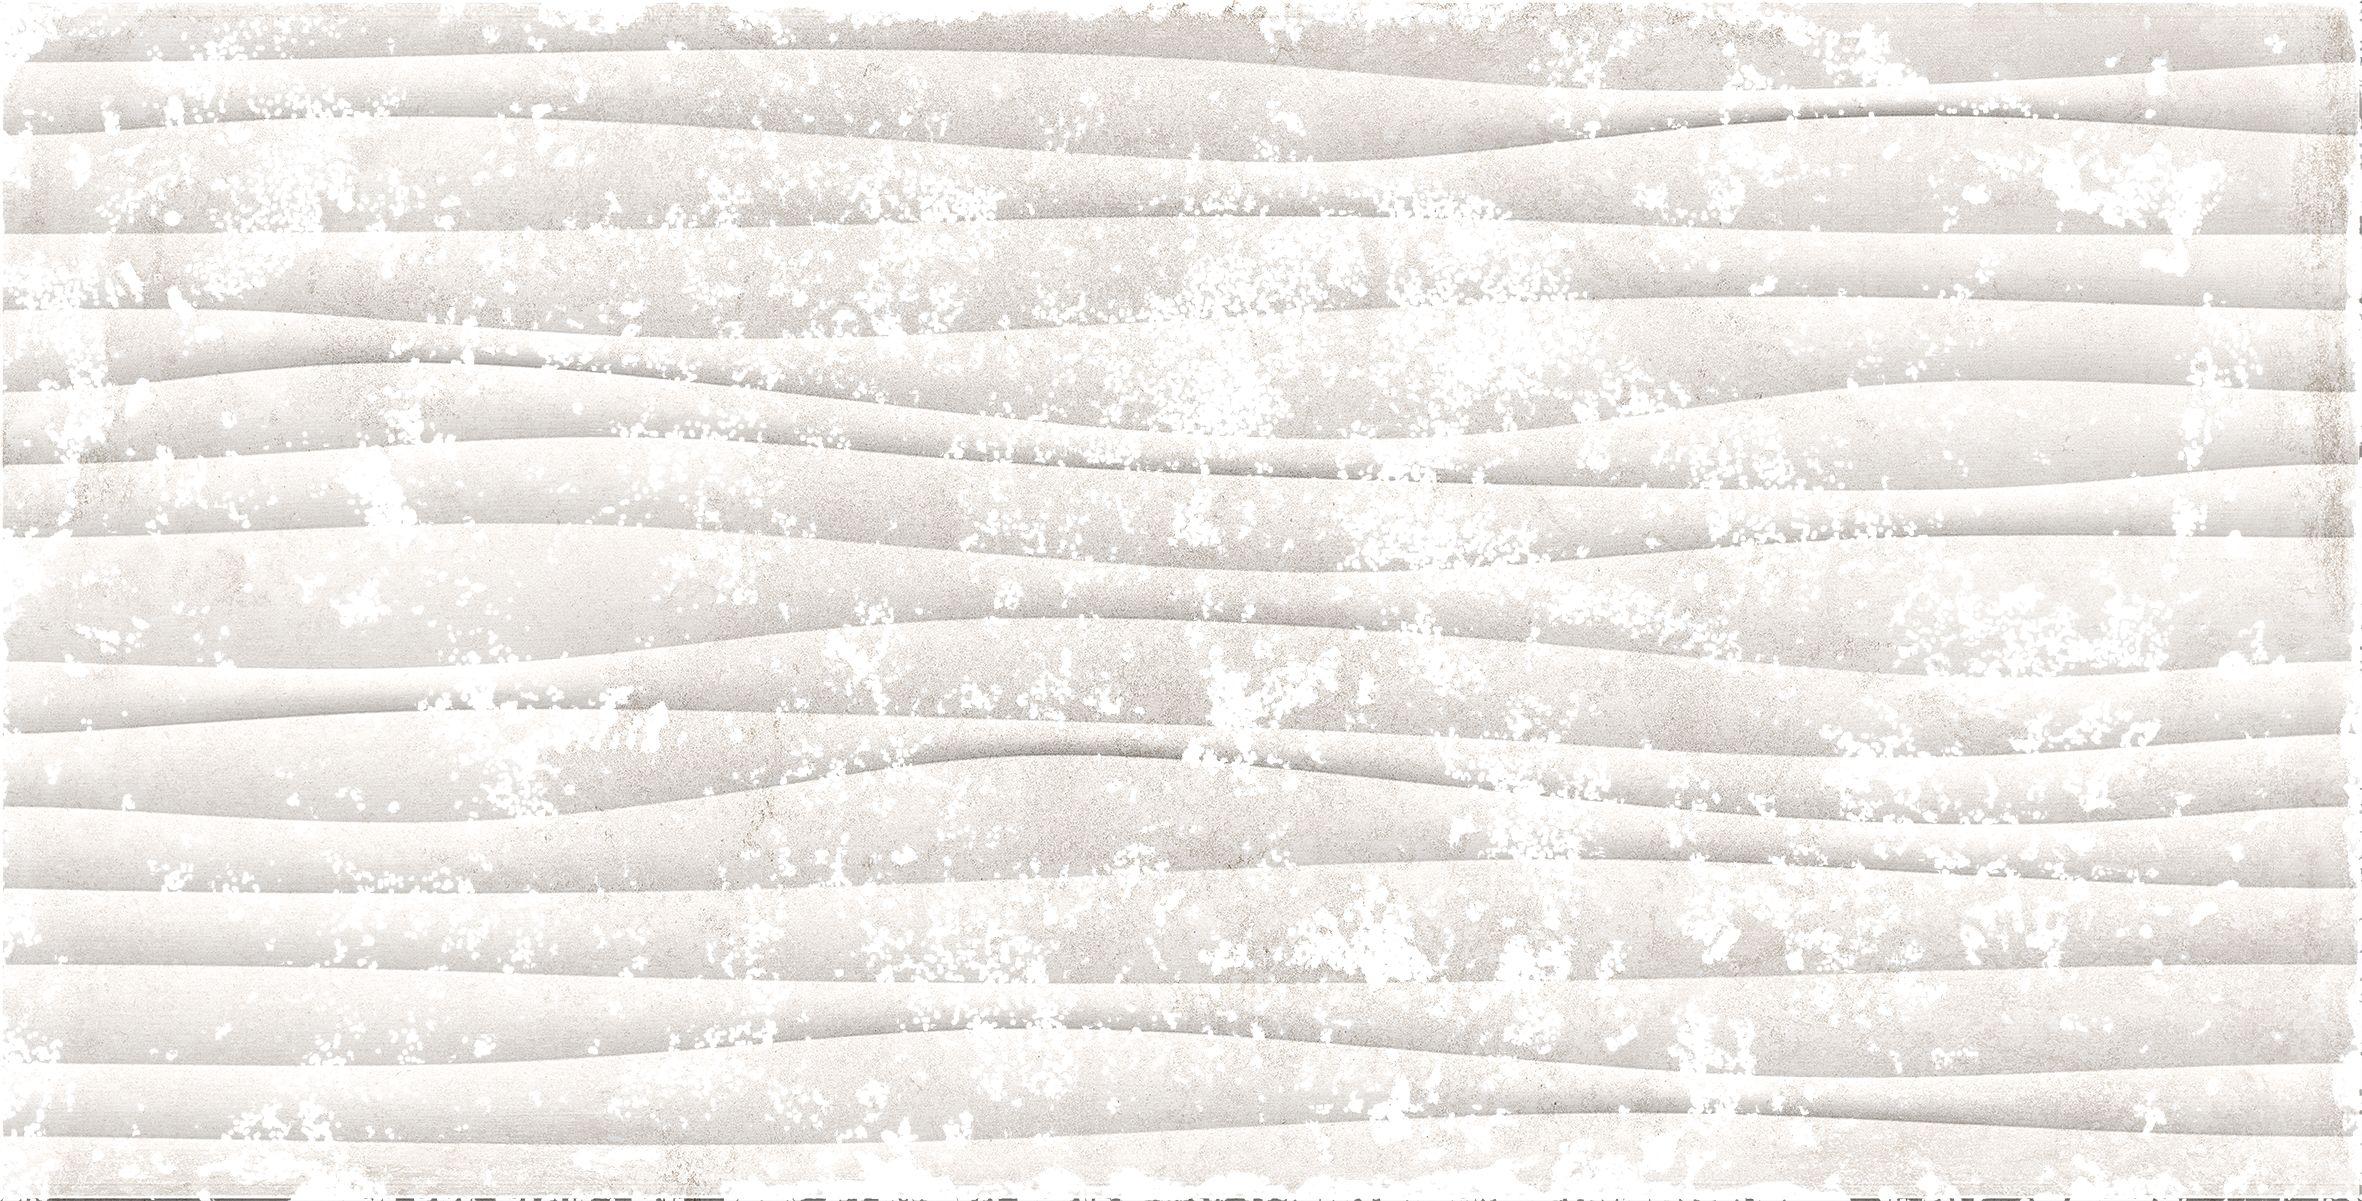 JÄÄK Gaia jura beige struct. GAA9301A rect. 30x60x0,8 II sort - Hansas Plaadimaailm